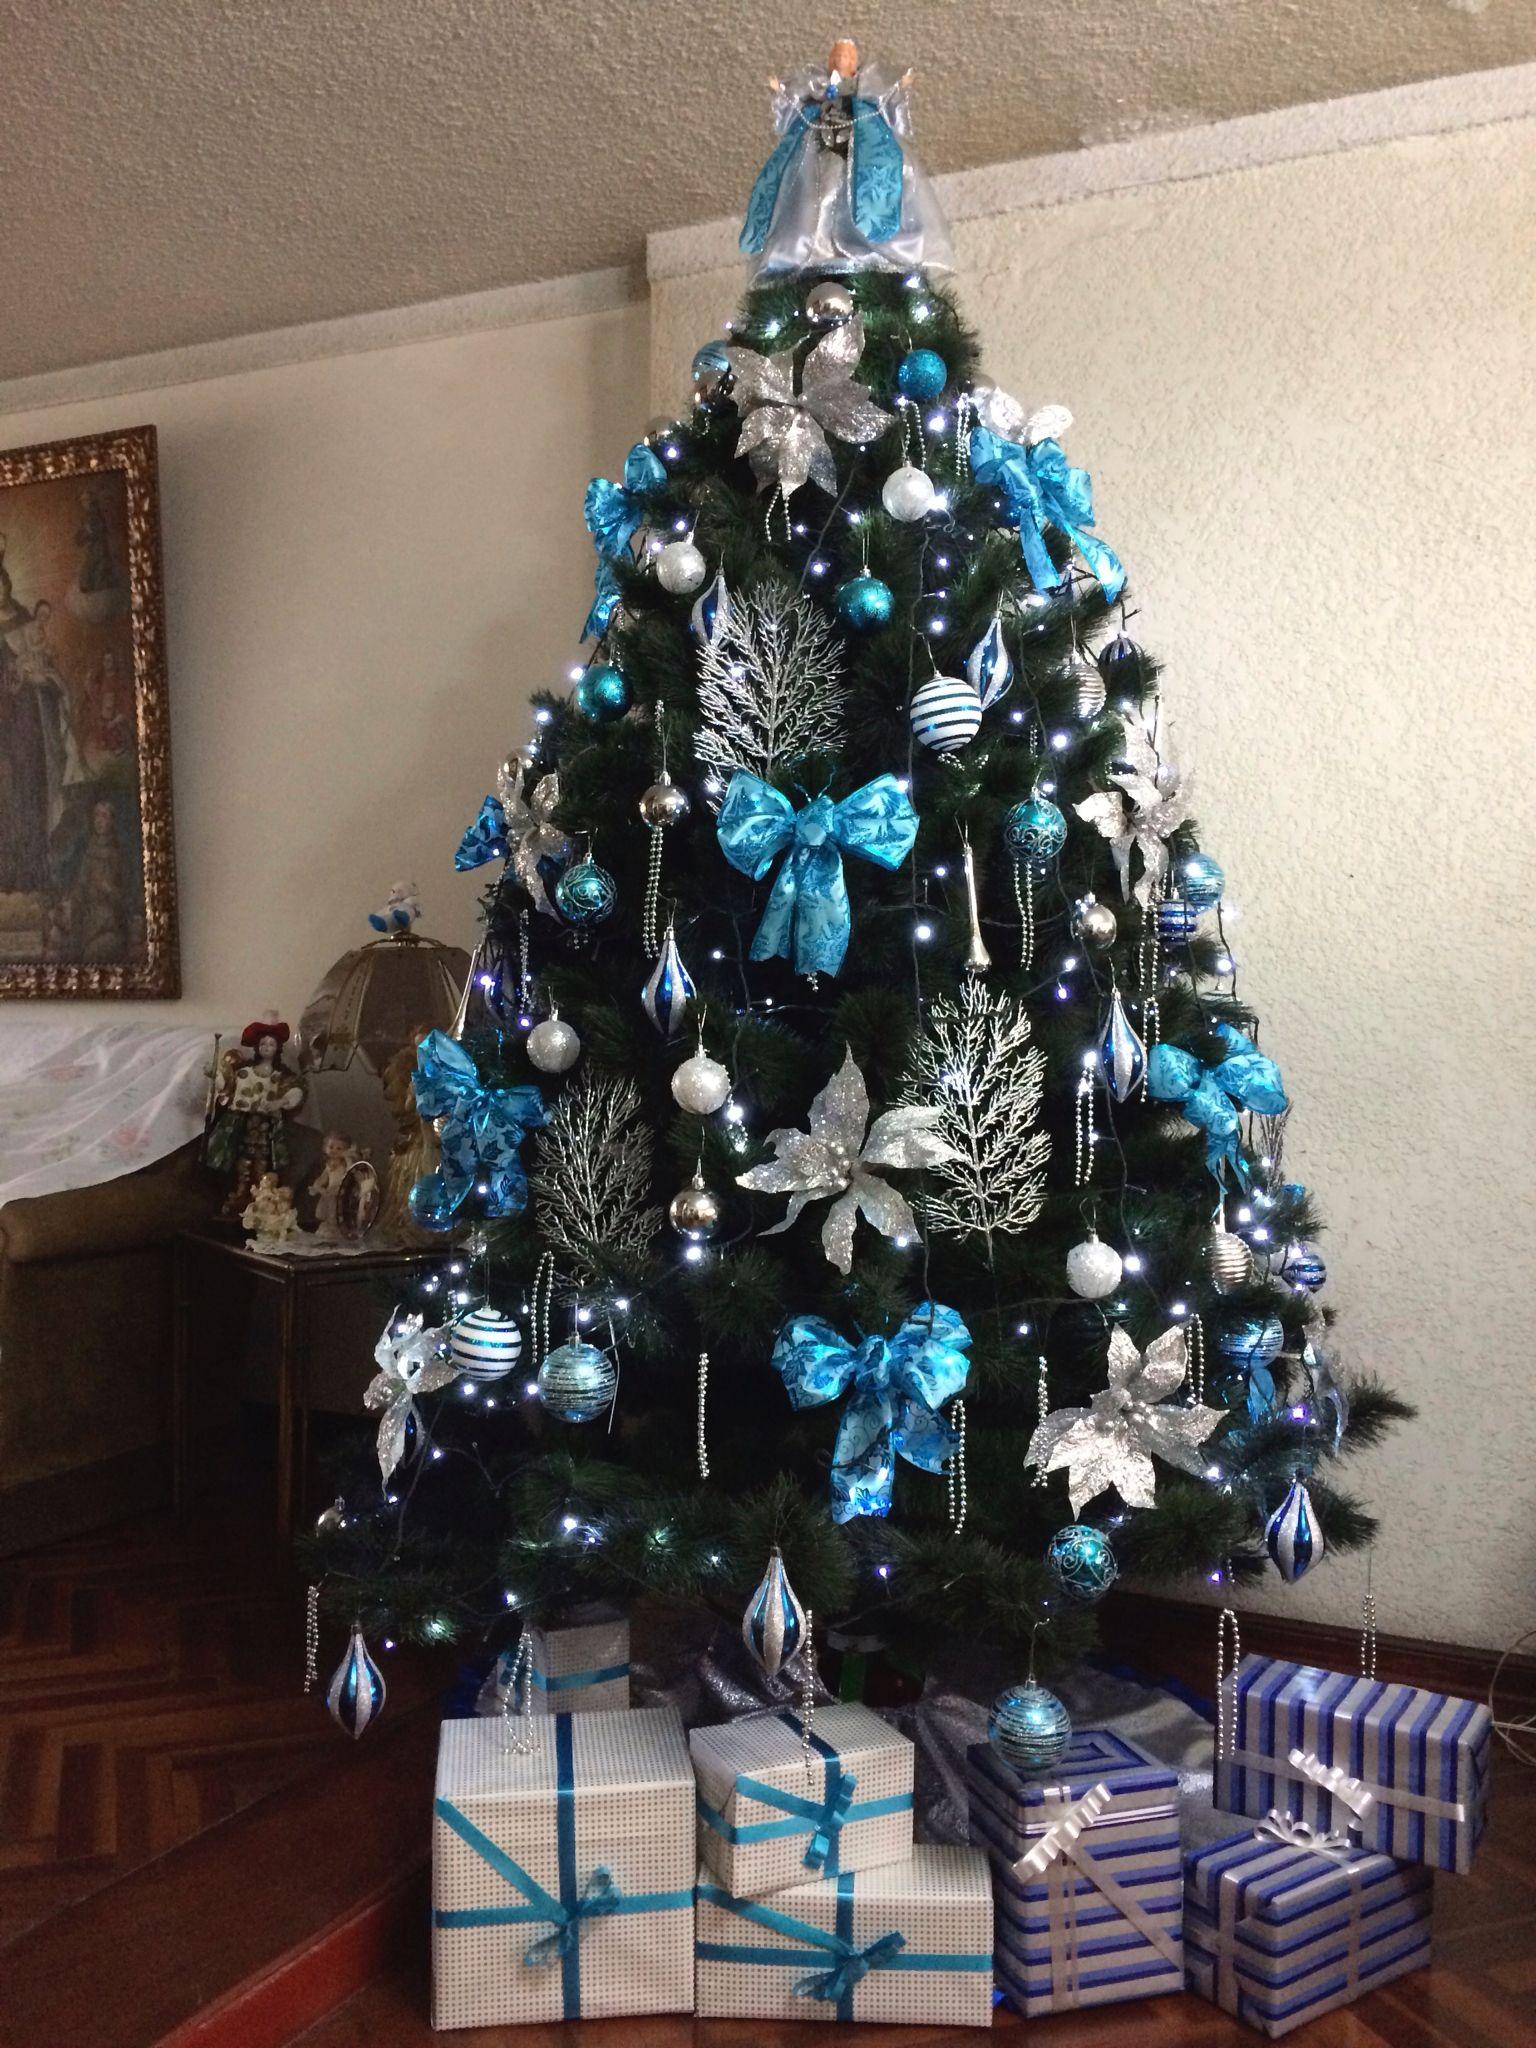 Arbol navidad turquesa ideas para el hogar pinterest for Arbol navidad turquesa